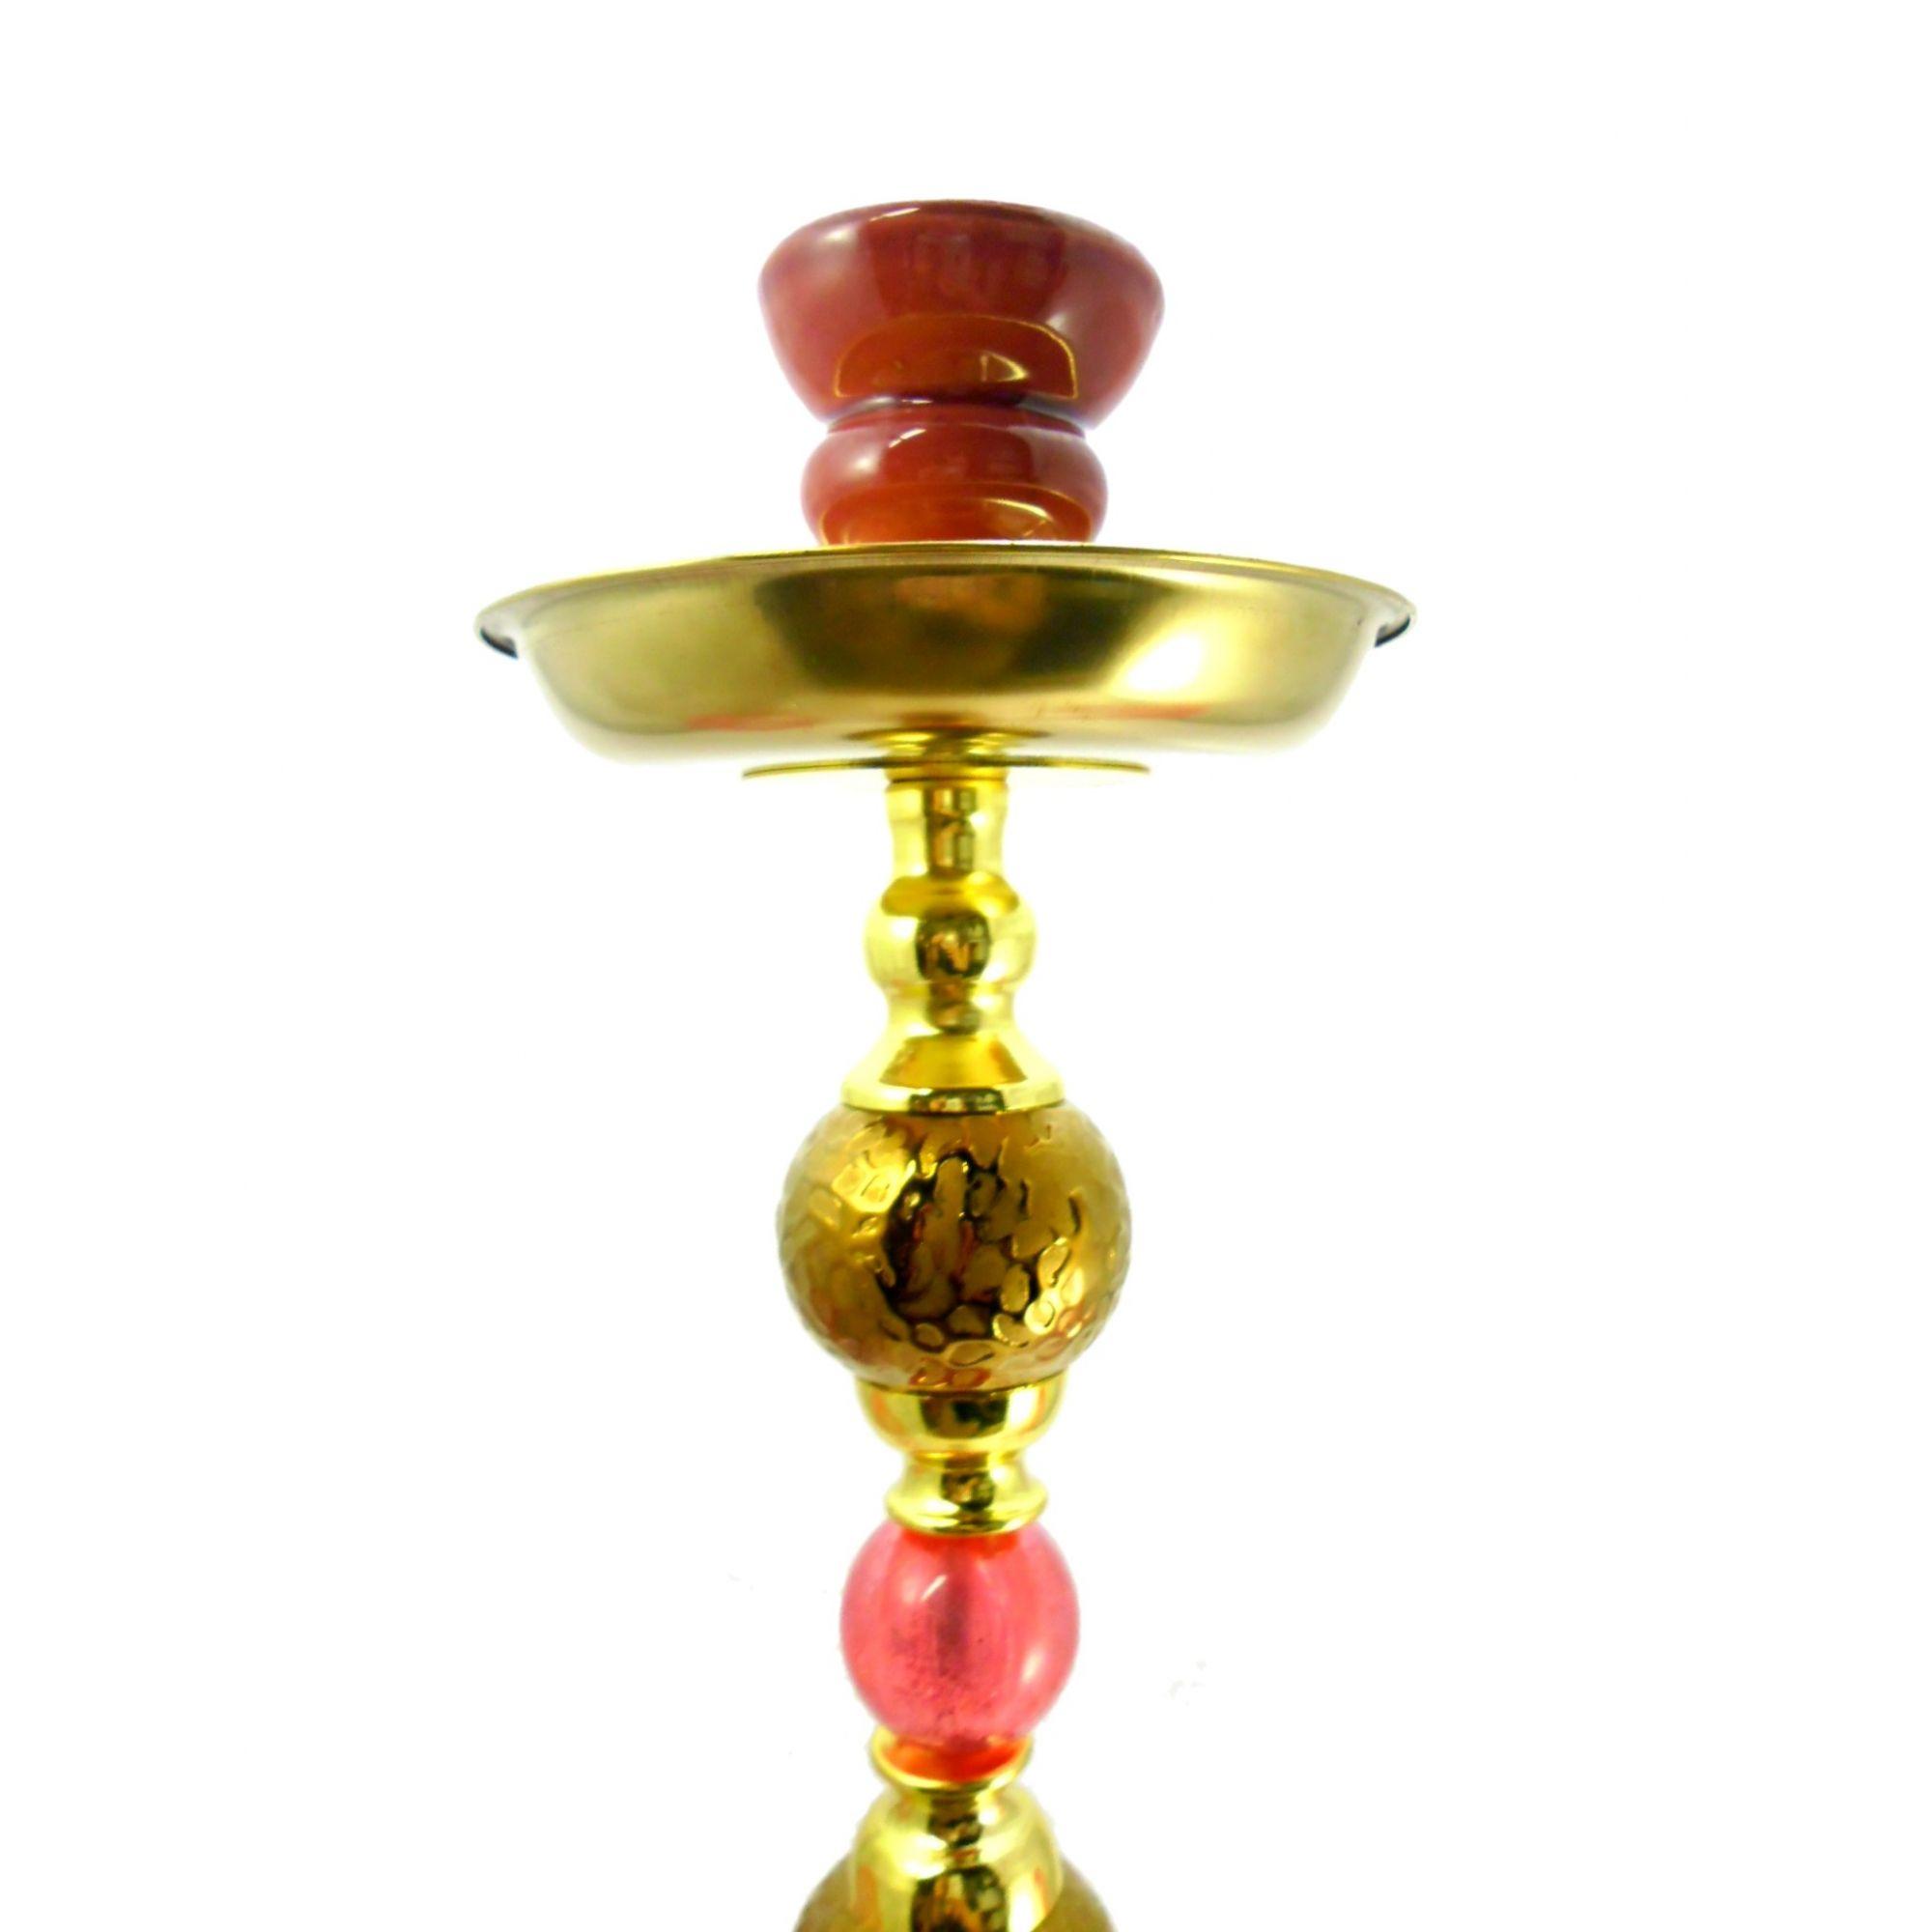 Narguile Yahya 59cm, duas mangueiras, vaso VERMELHO desenhado, corpo decorado baixo relevo Y07VM Dourado (corpo)